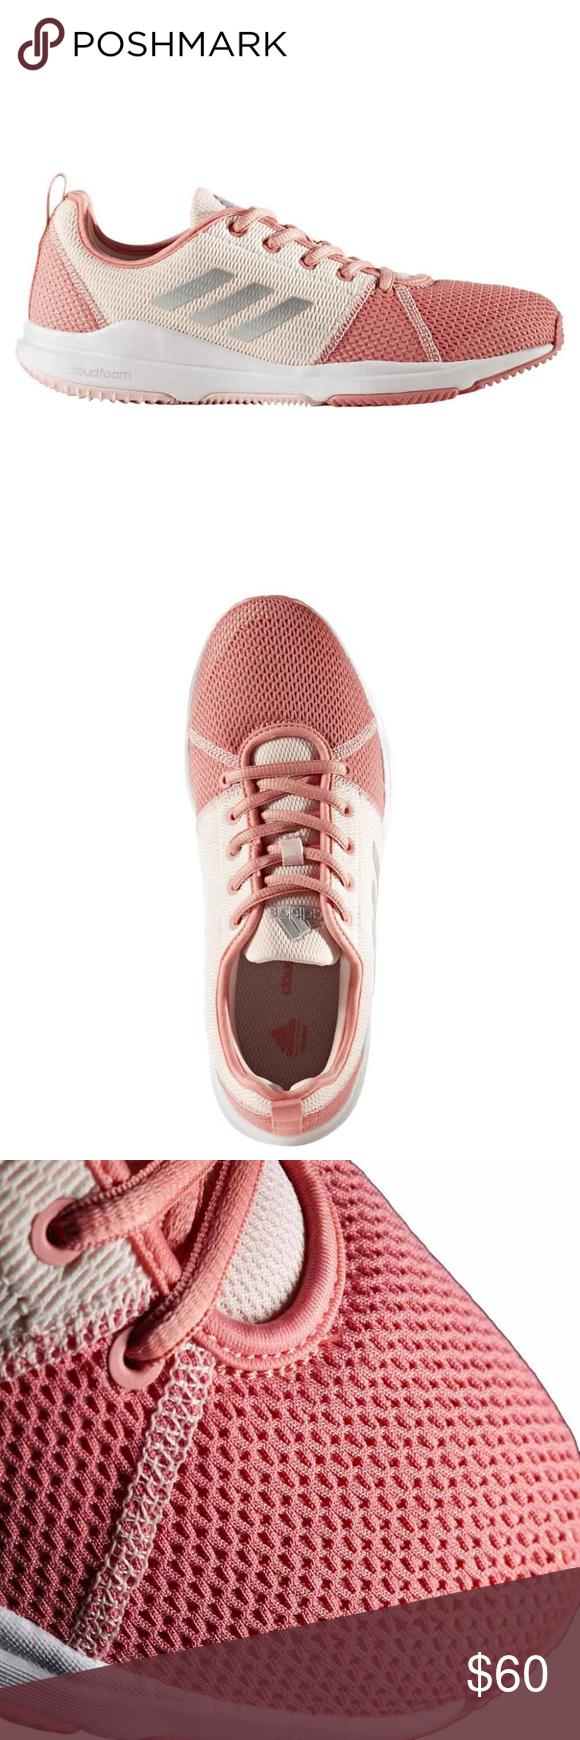 ADIDAS ARIANNA CLOUDFOAM BB3248 TRAINING SHOES   Adidas shoes ...